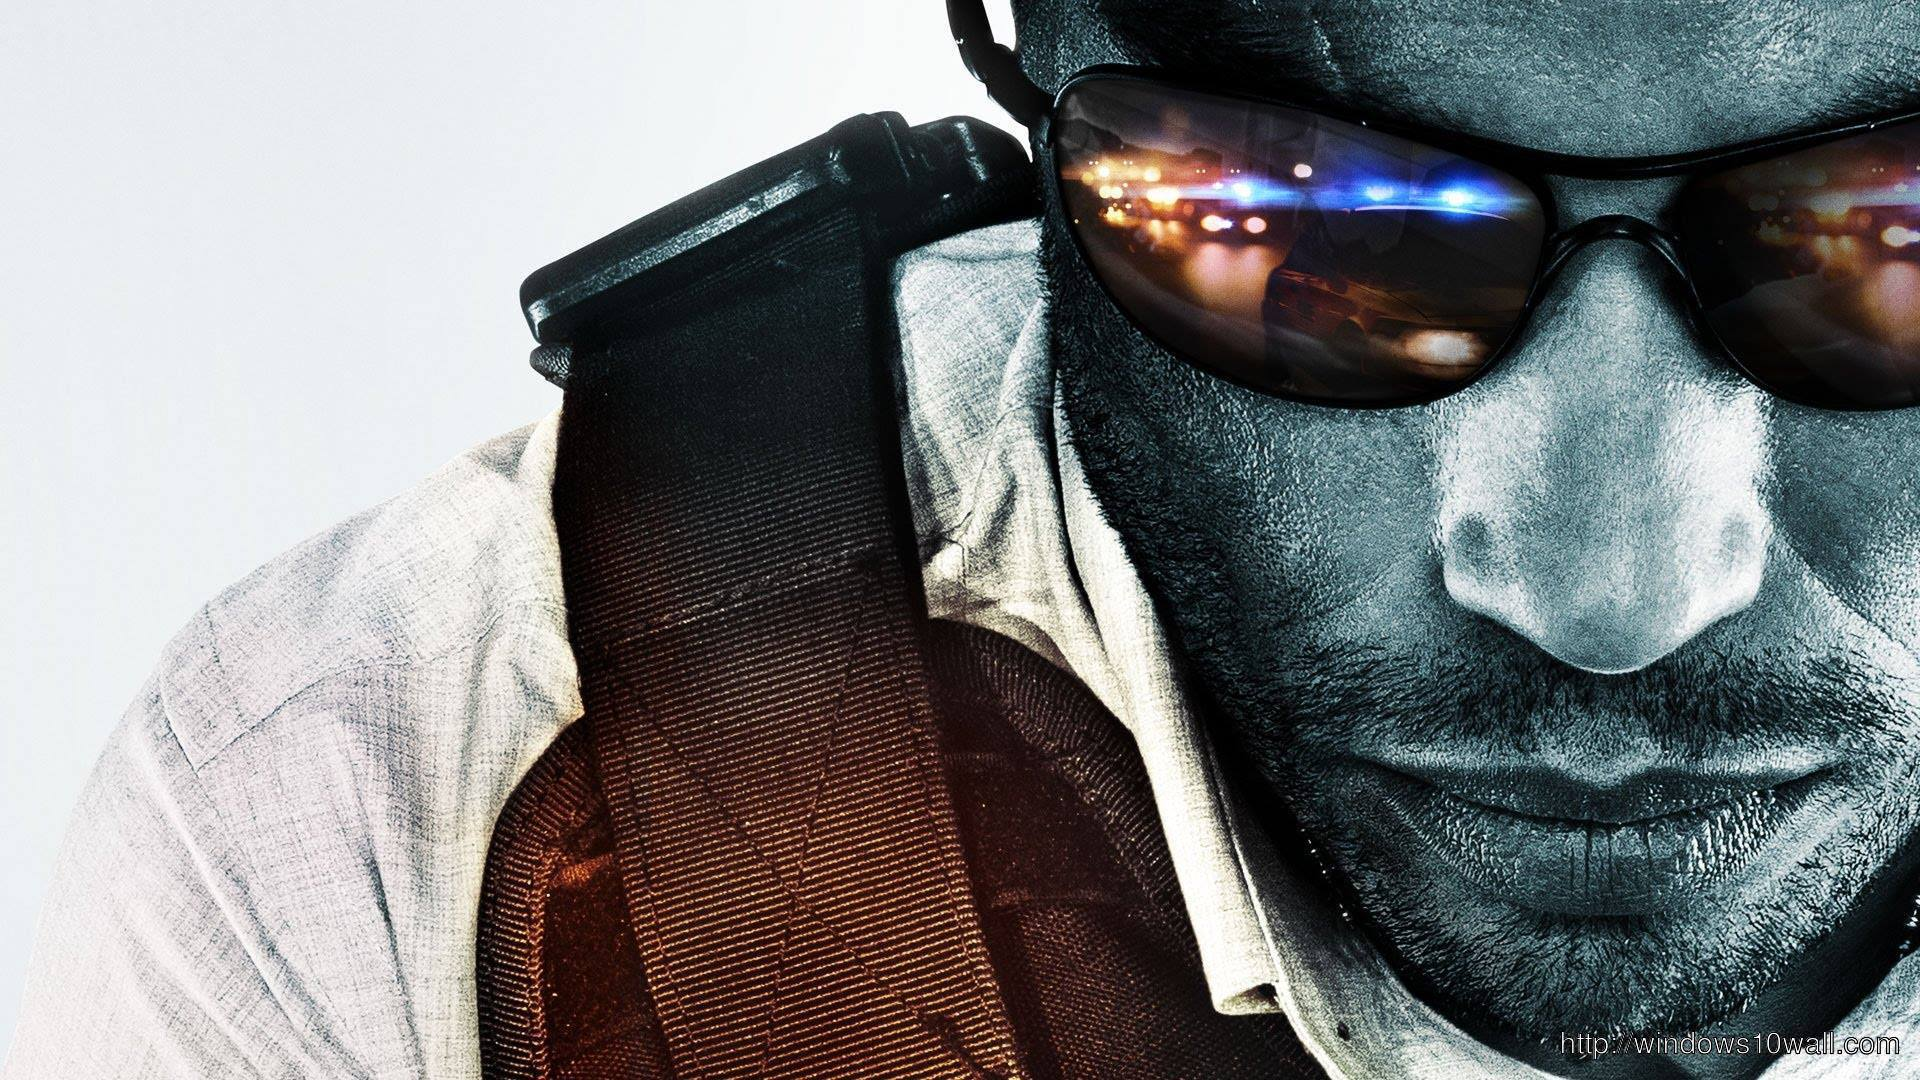 Battlefield Hardline HD Background Wallpaper